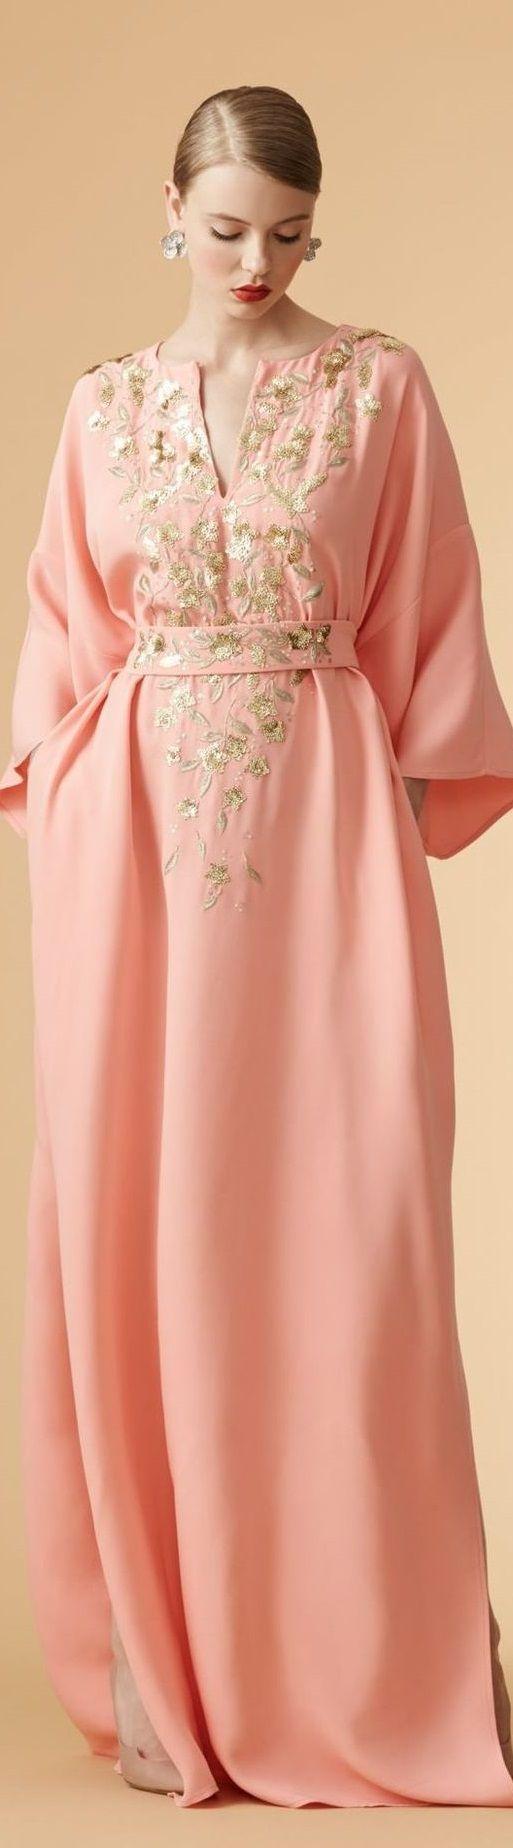 Carolina herrera resort peach orange haute couture